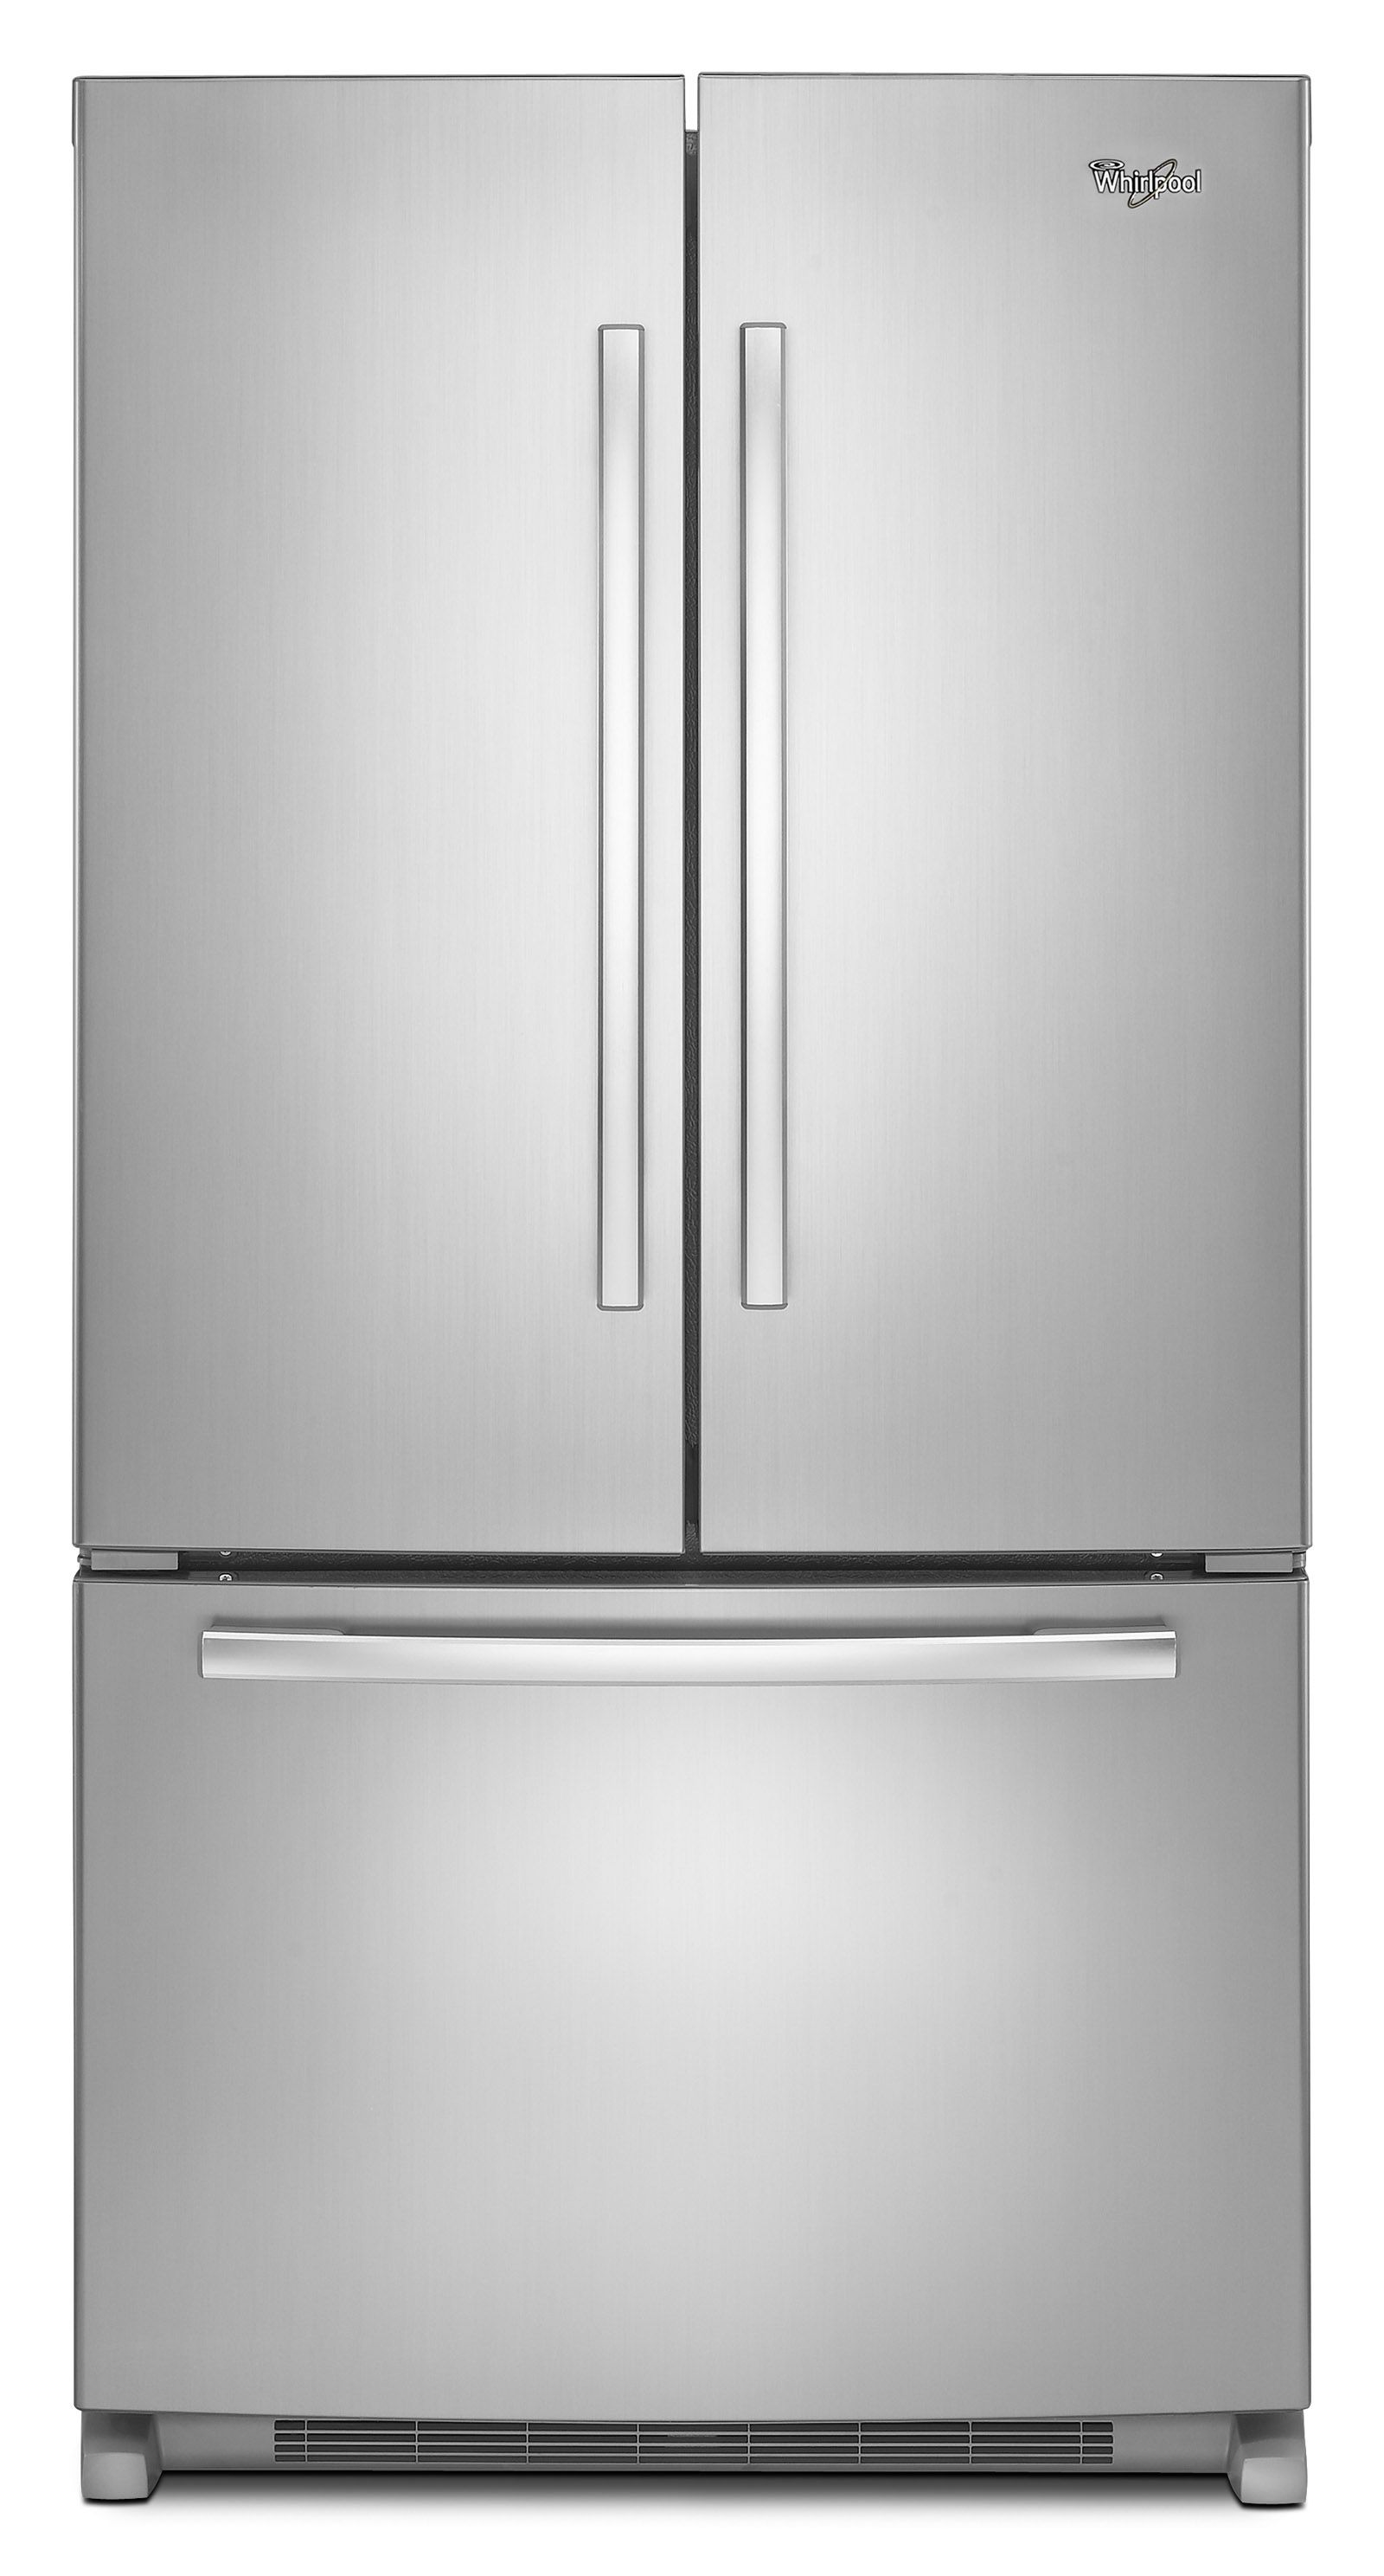 Whirlpool 20 Cu Ft Counter Depth French Door Refrigerator W